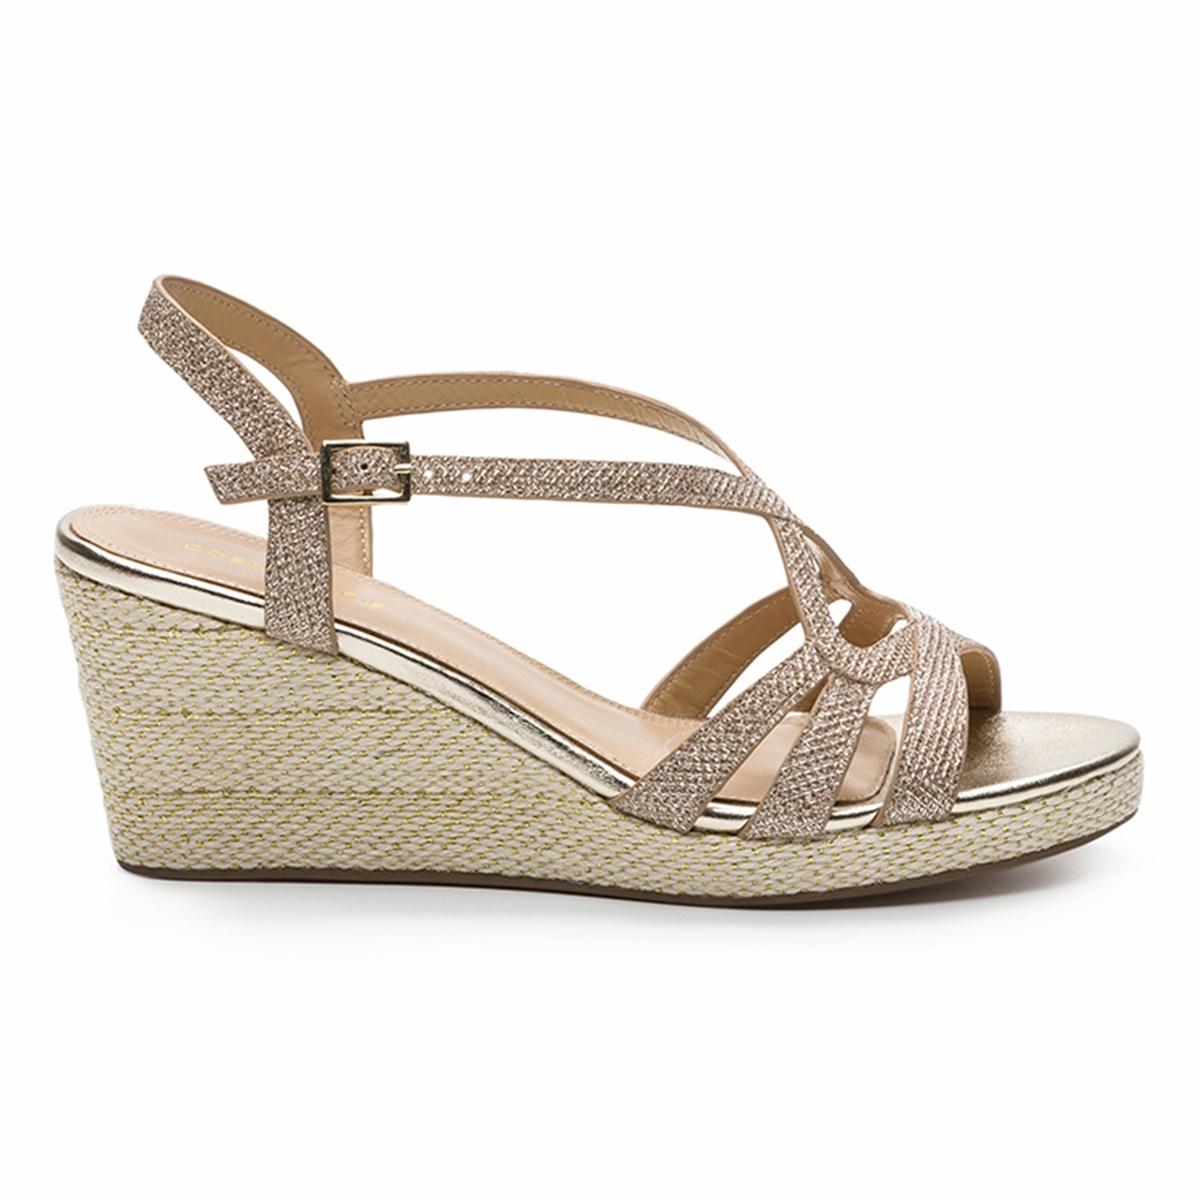 Sandálias de cunha, Joft Glit